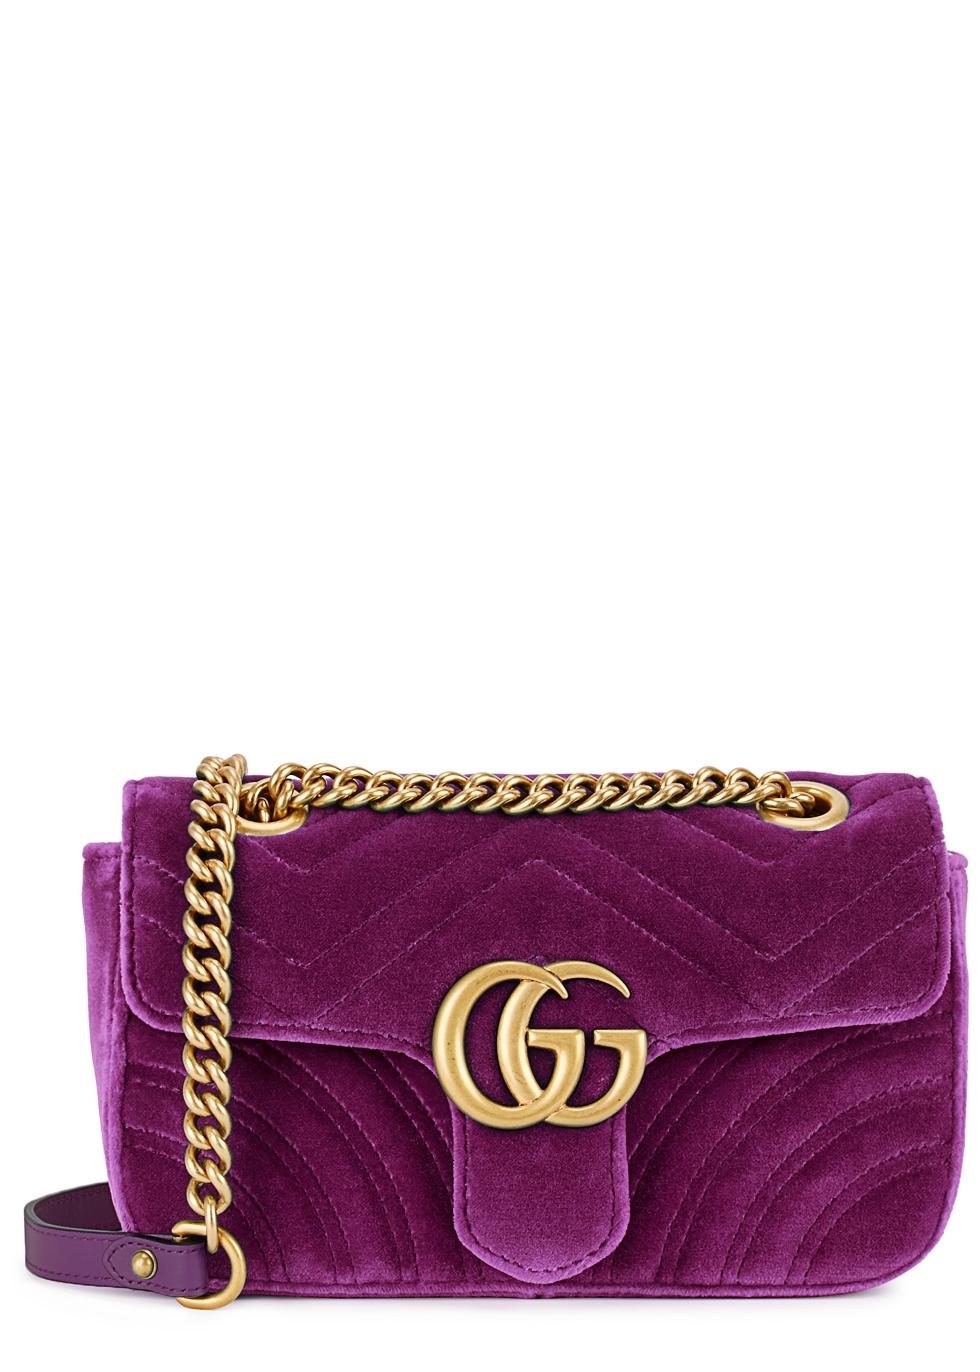 d6d38cc19809 Women s Designer Bags